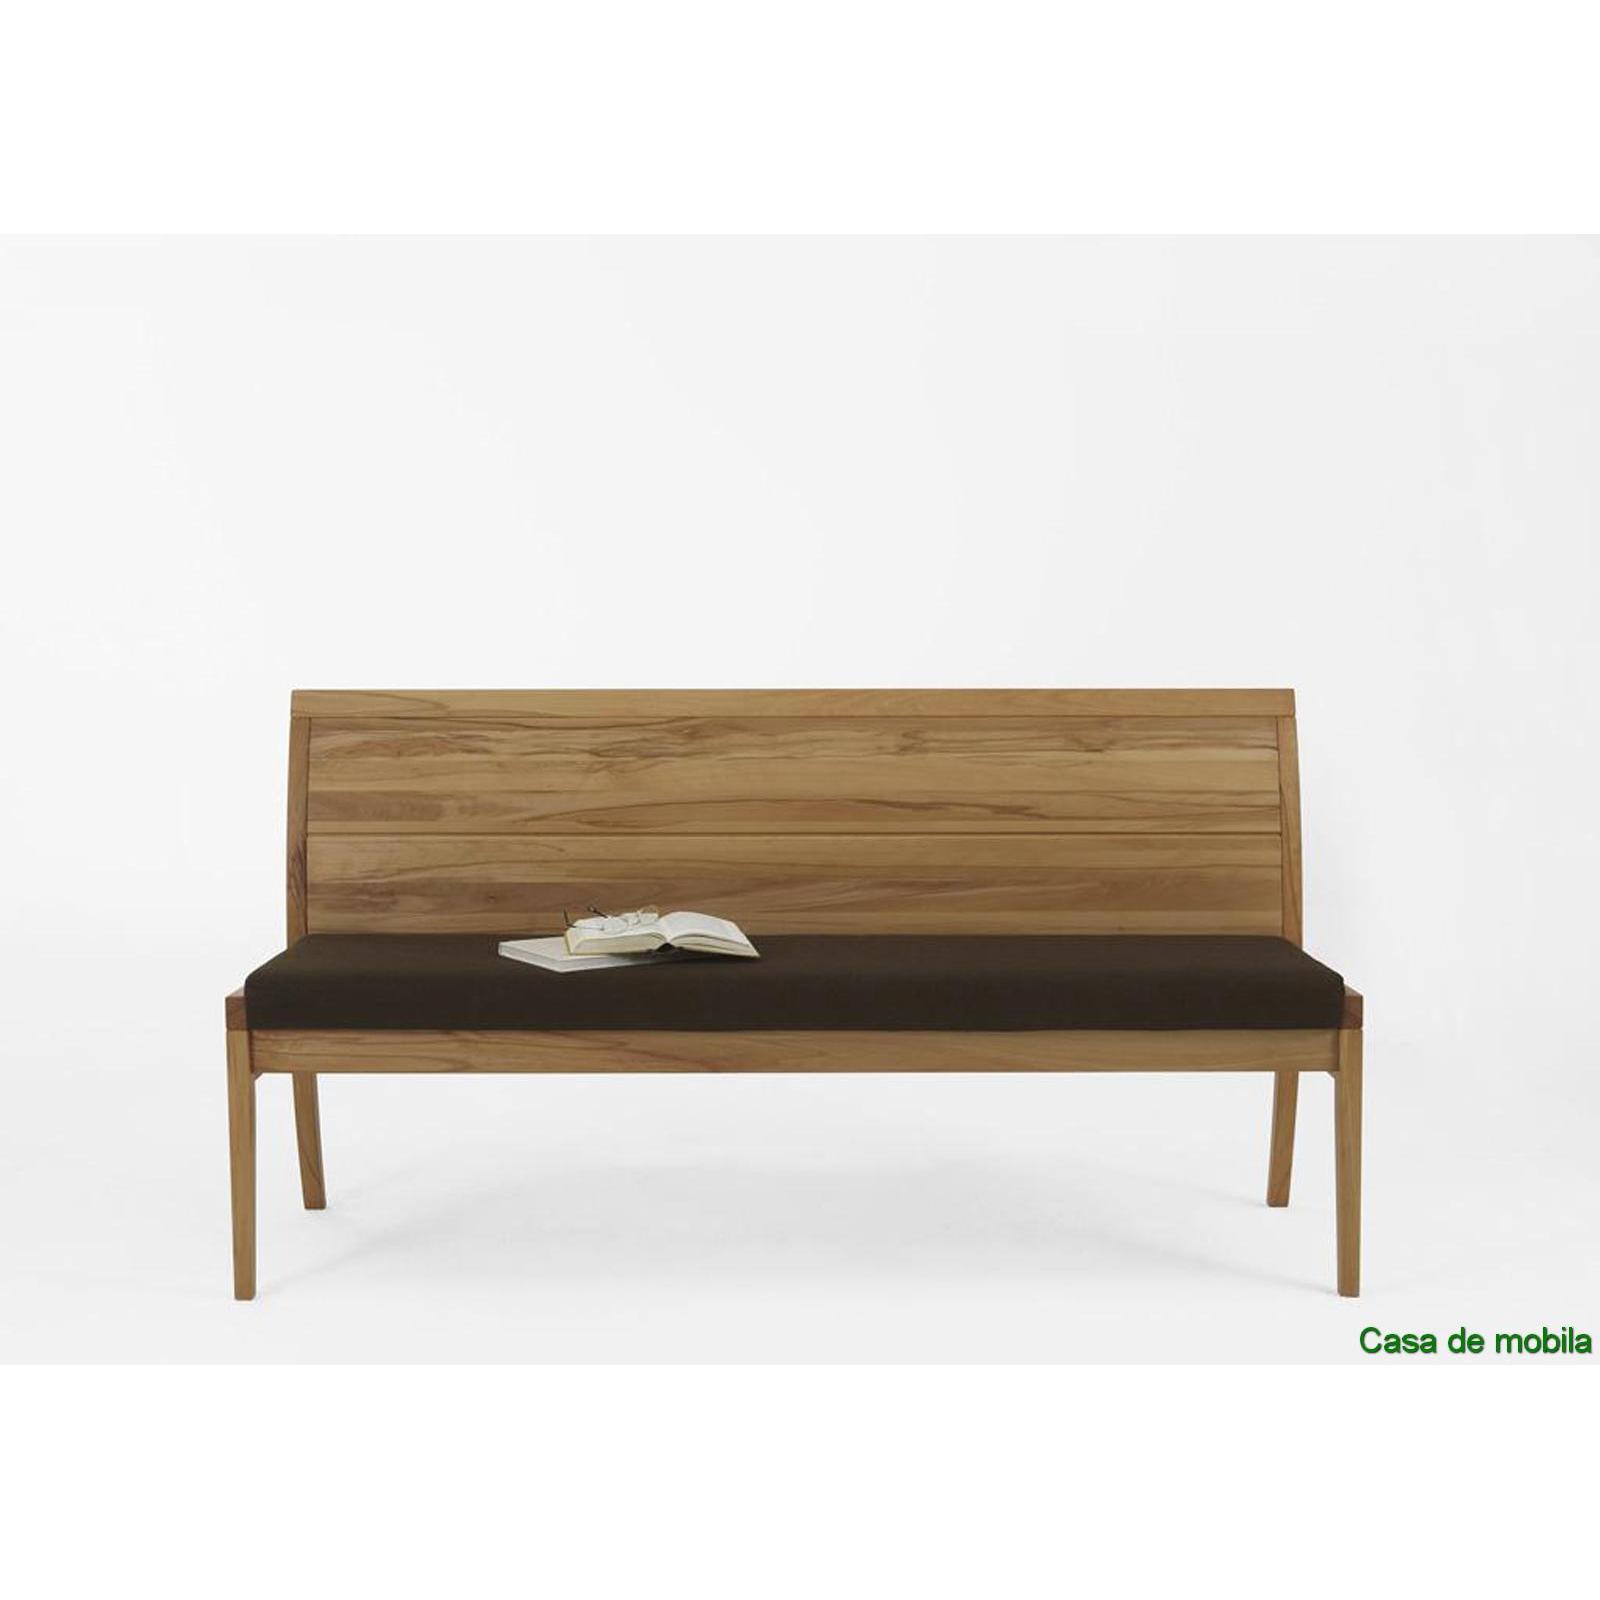 bank mit r ckenlehne bank 170 cm kernbuche massiv natur ge lt casera. Black Bedroom Furniture Sets. Home Design Ideas